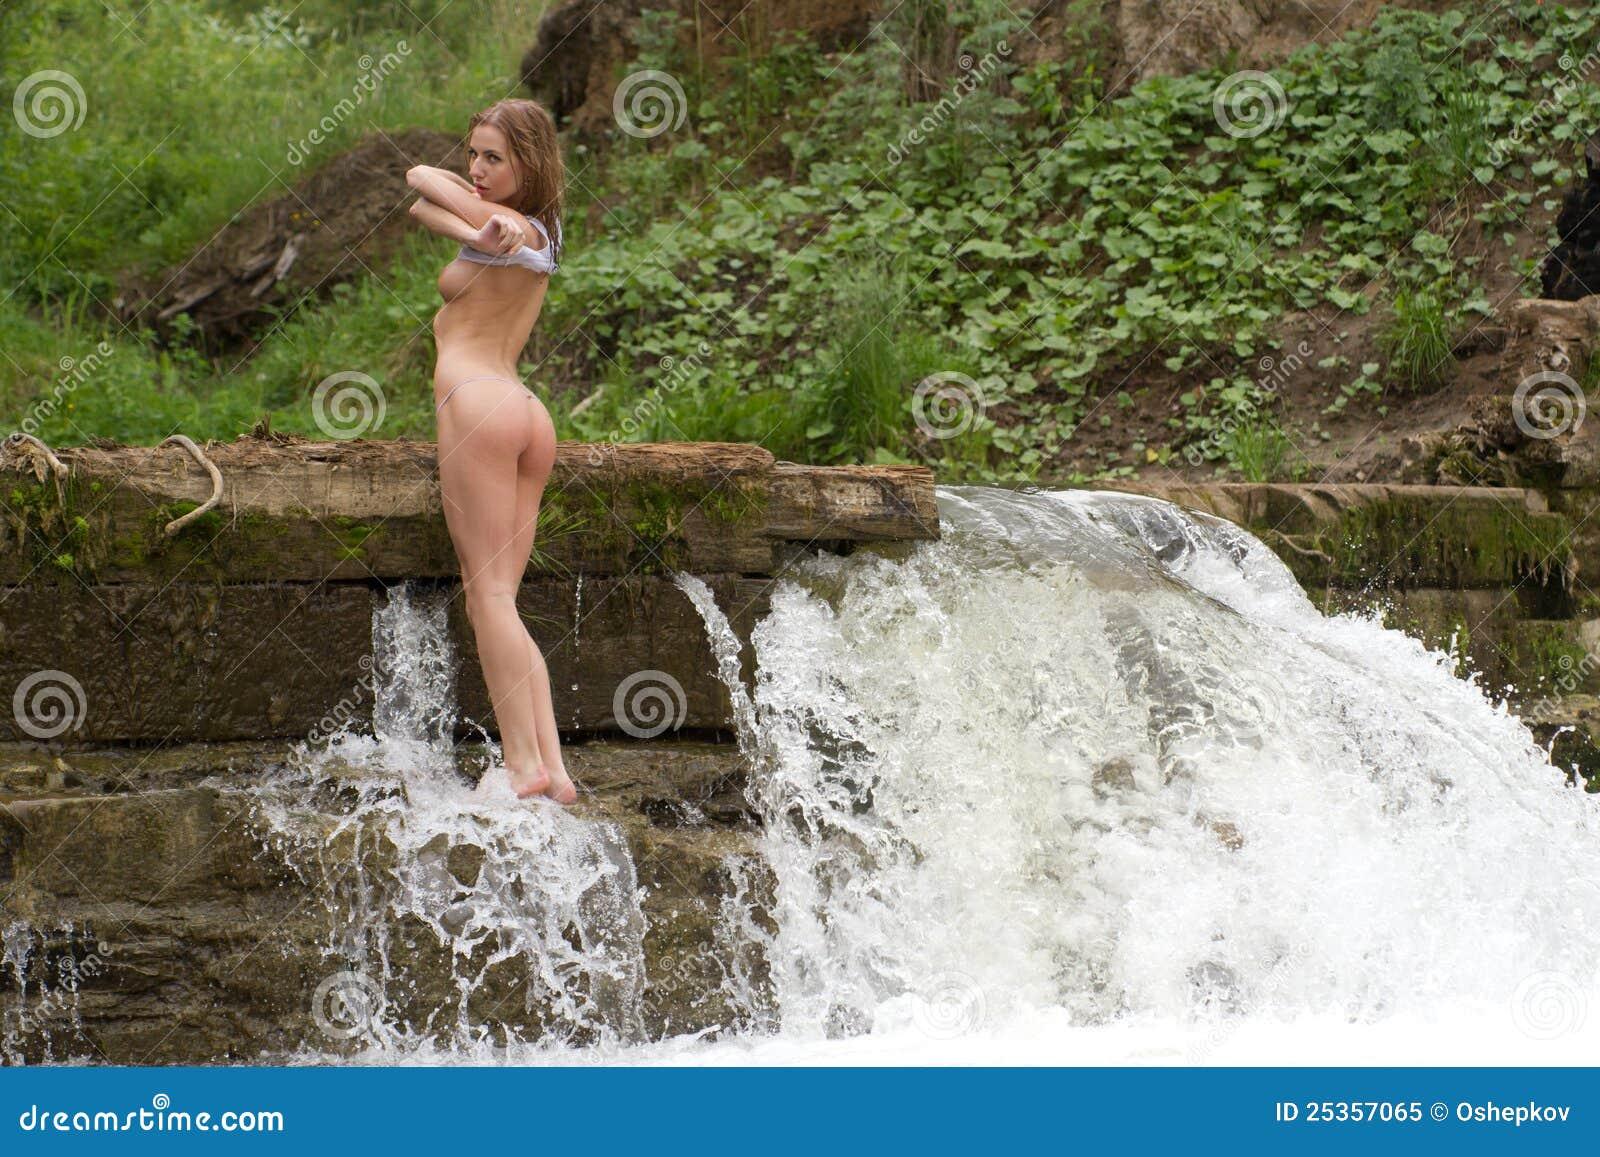 Waterfall Naked 80